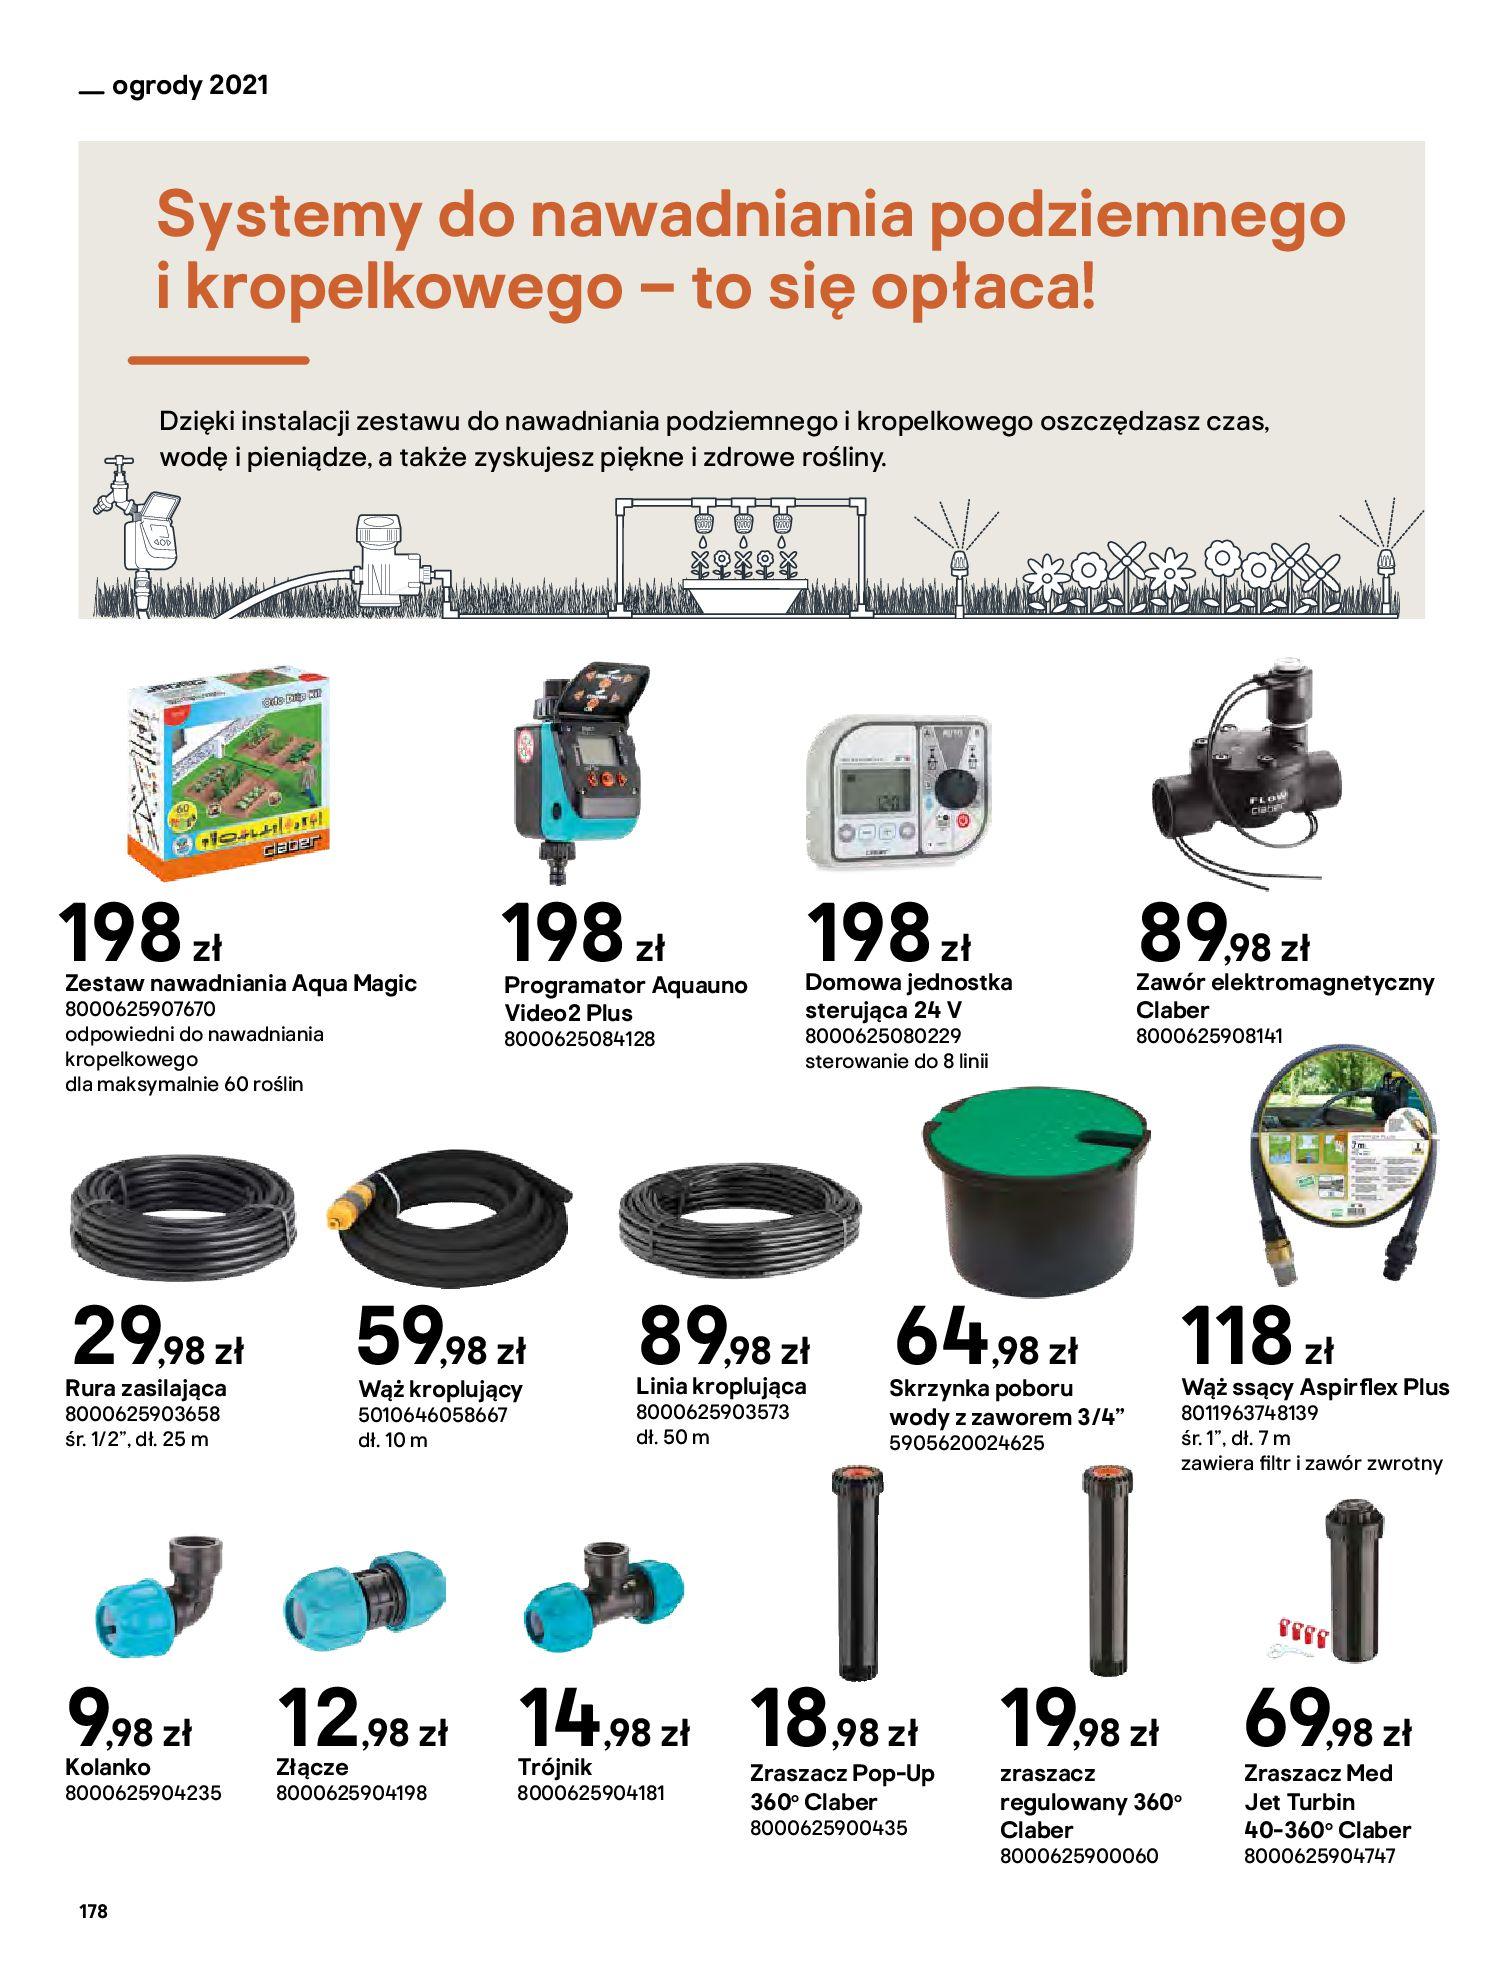 Gazetka Castorama: Katalog ogrody 2021-03-01 page-178